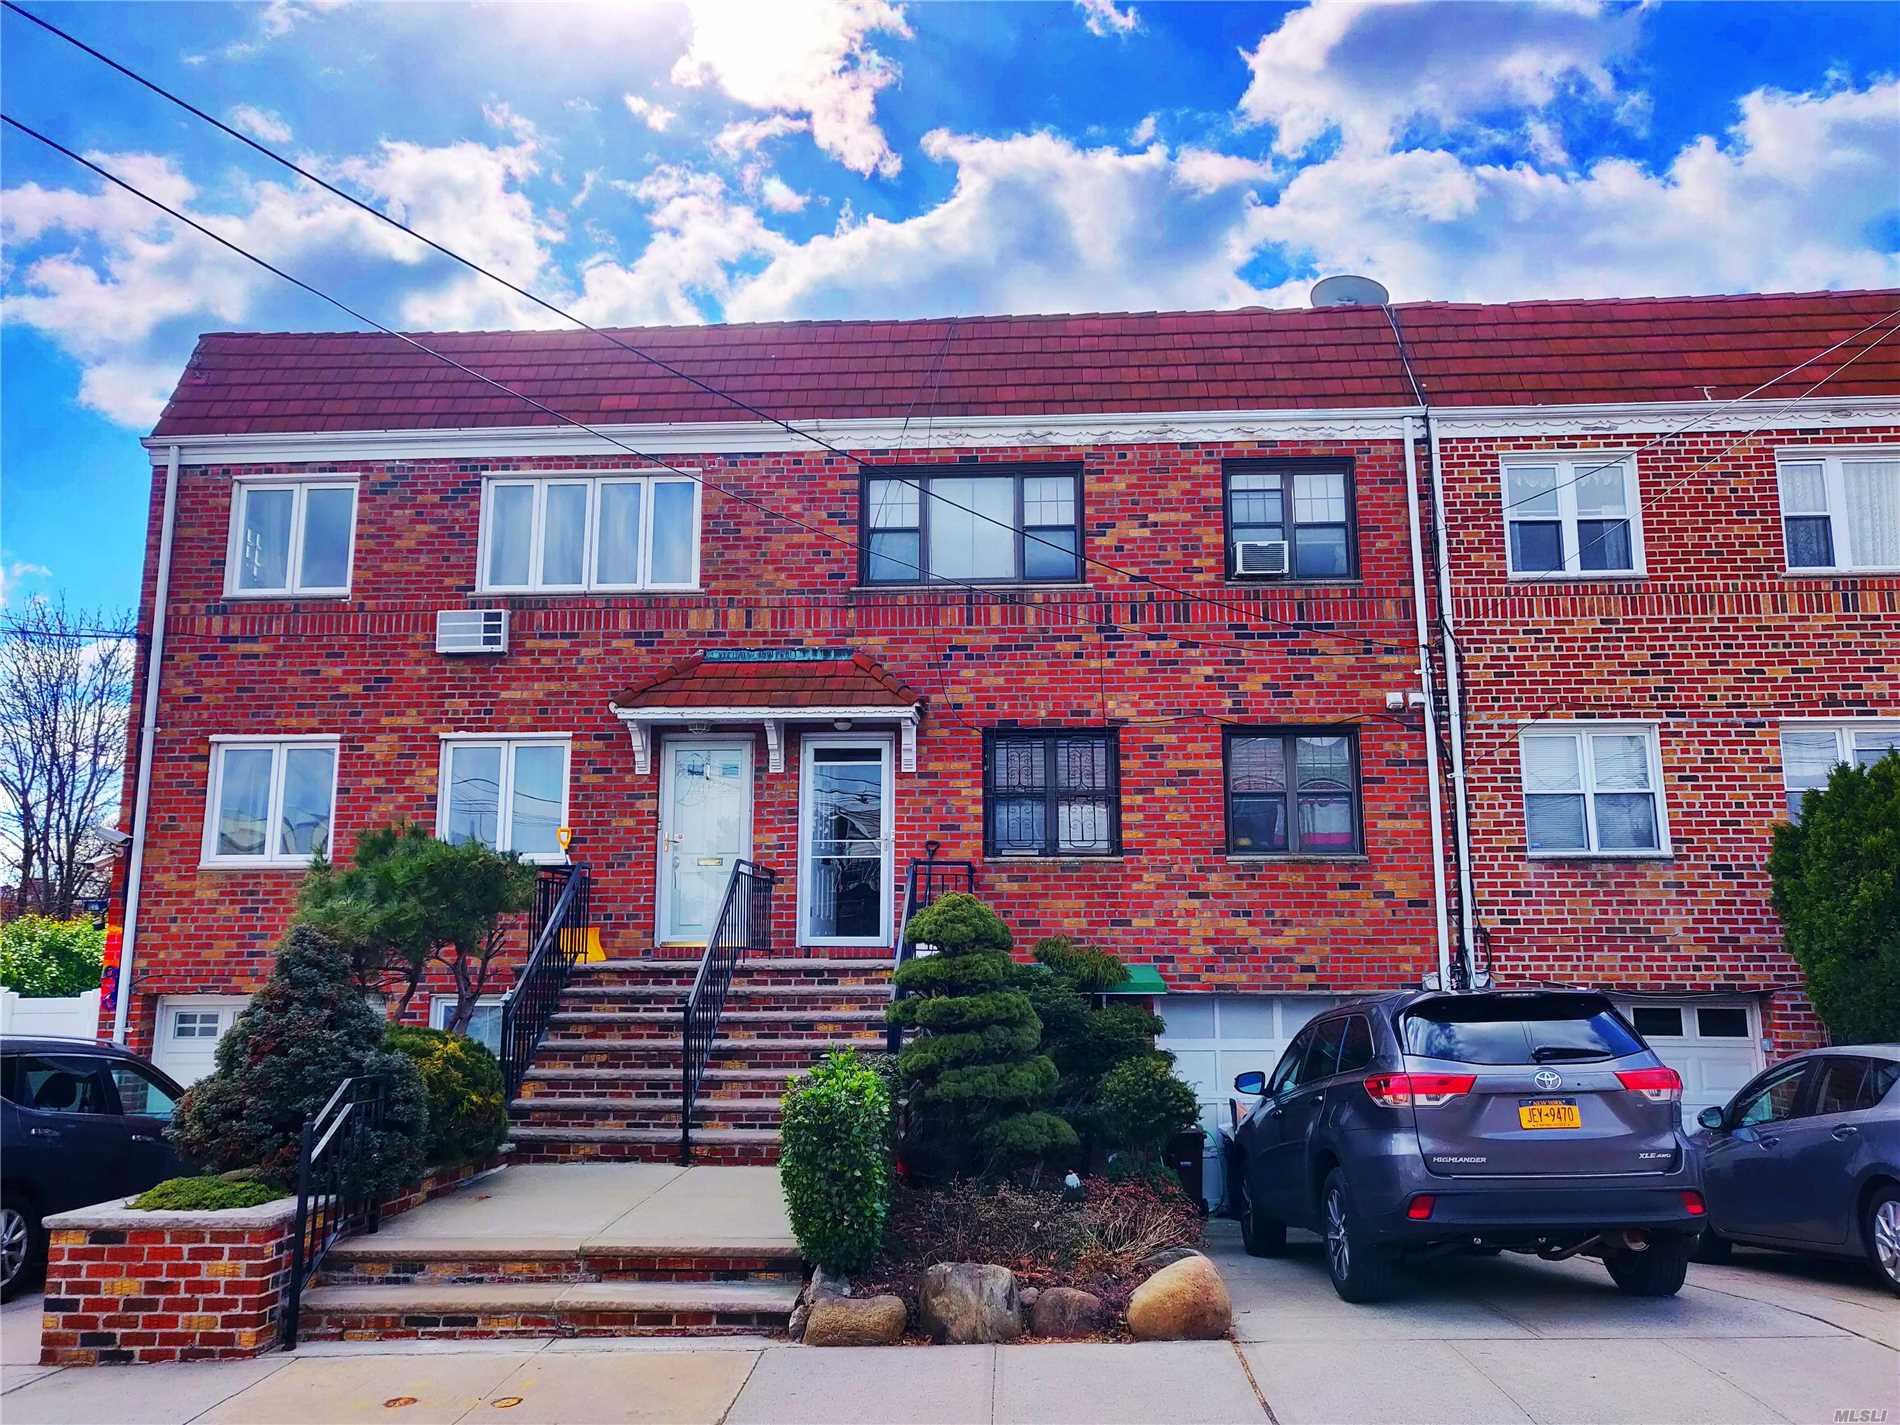 Property for sale at 69-30 52 Drive, Maspeth NY 11378, Maspeth,  New York 11378